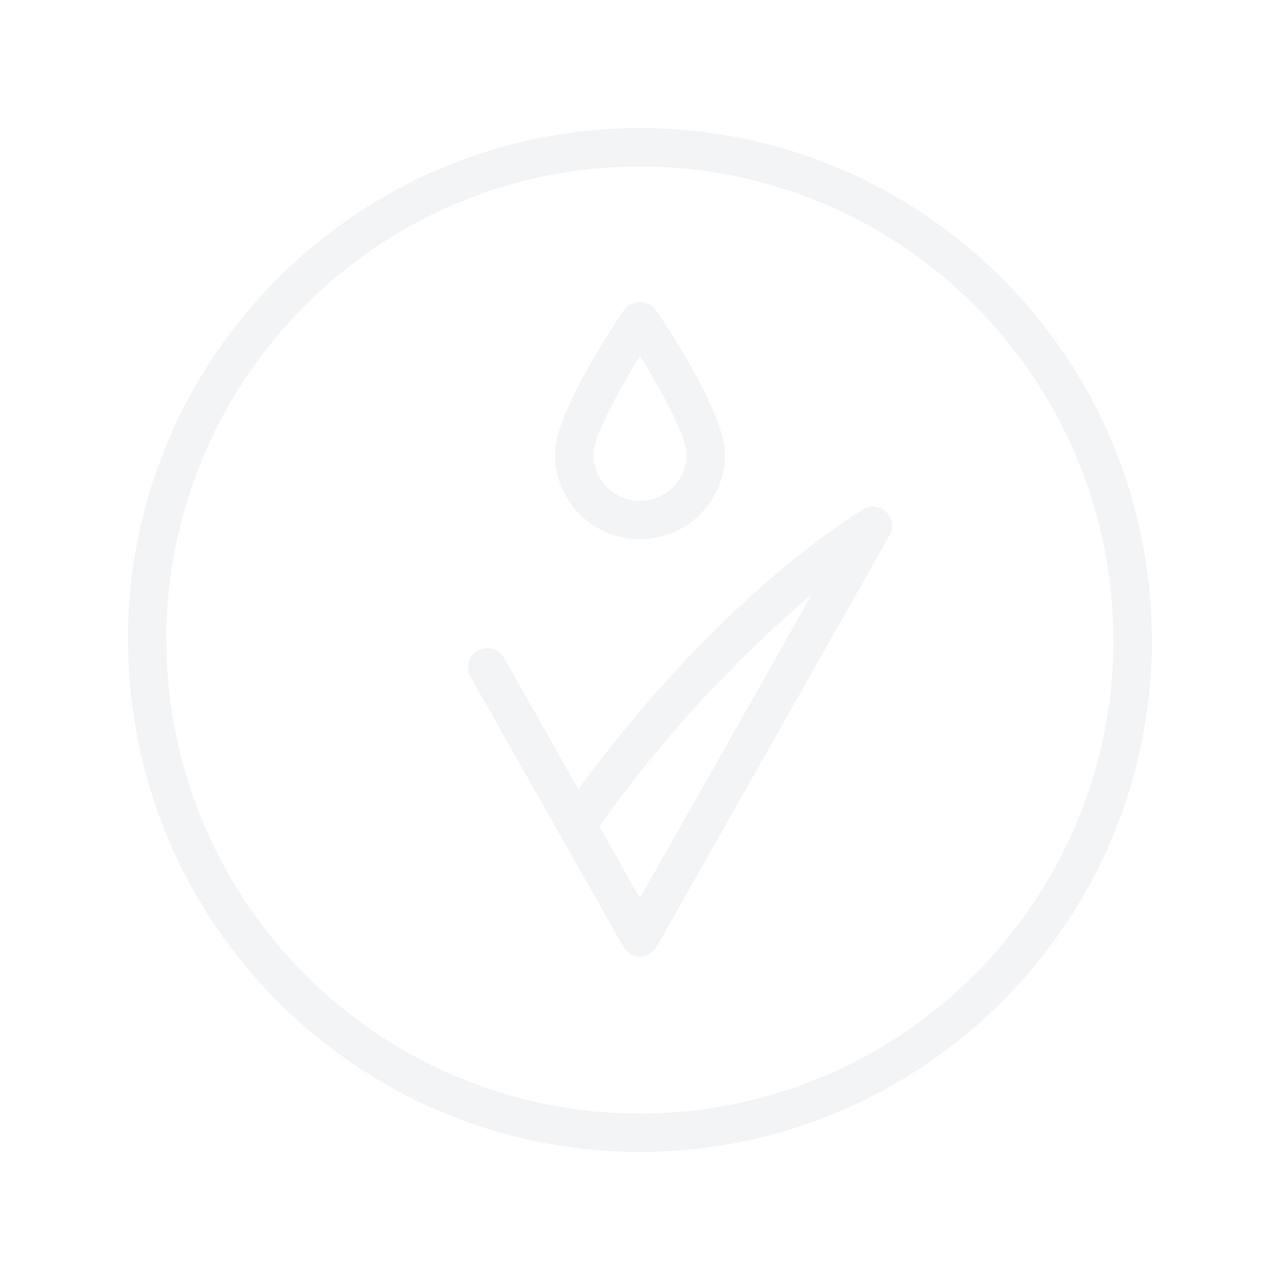 COLLISTAR Sublime Black Precious Eye Contour 40x0.13ml